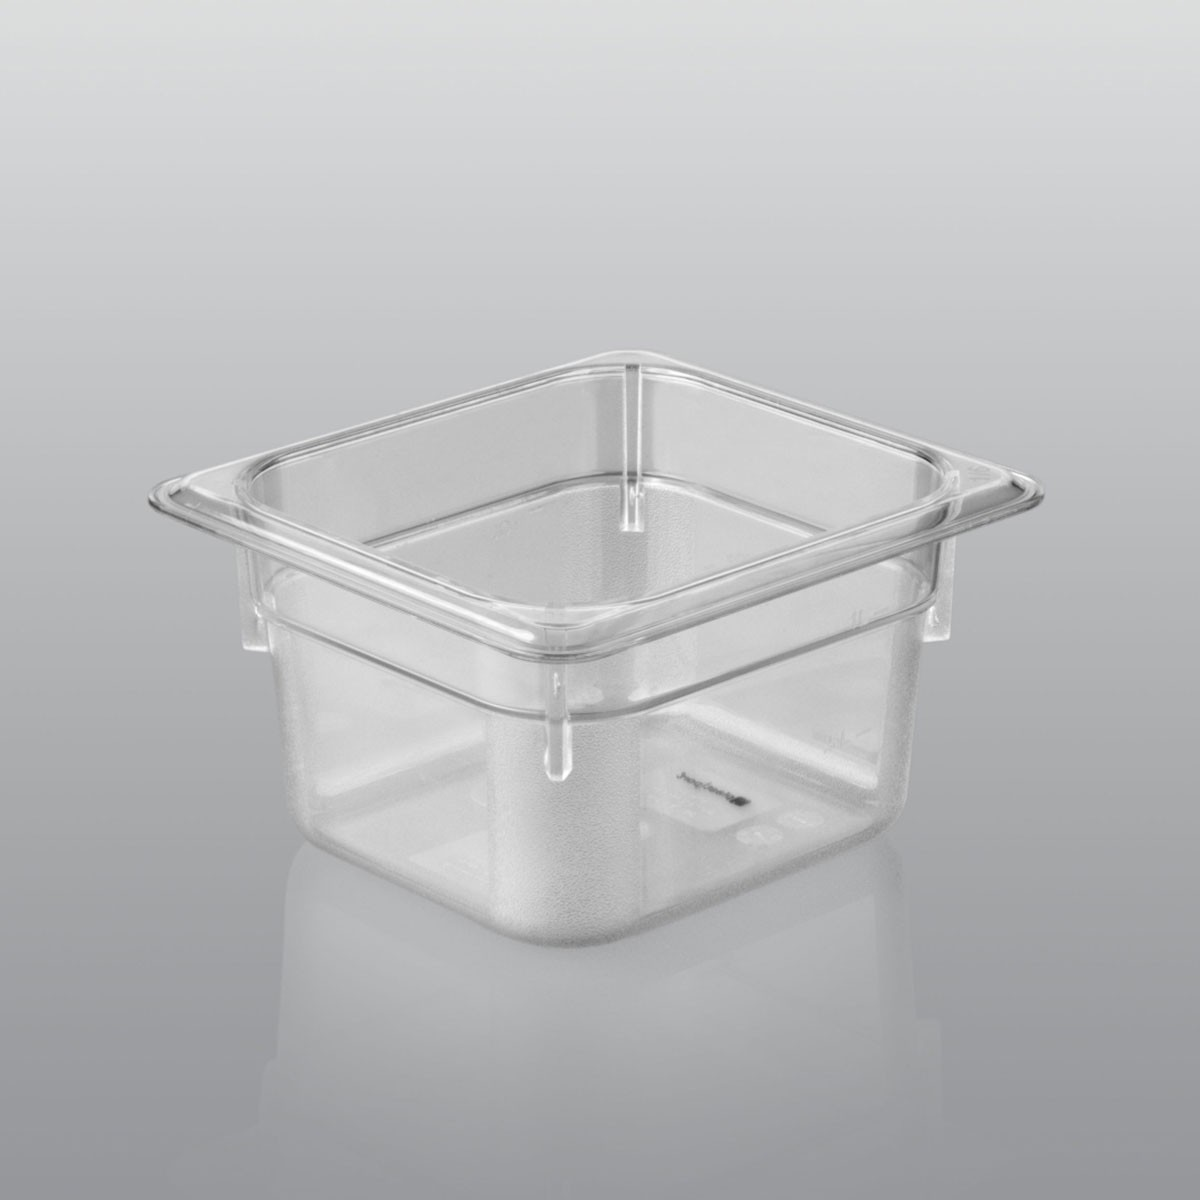 GN-Behälter GN 1/6 aus Polycarbonat (Tiefe: 150mm) 2,4 L Saro